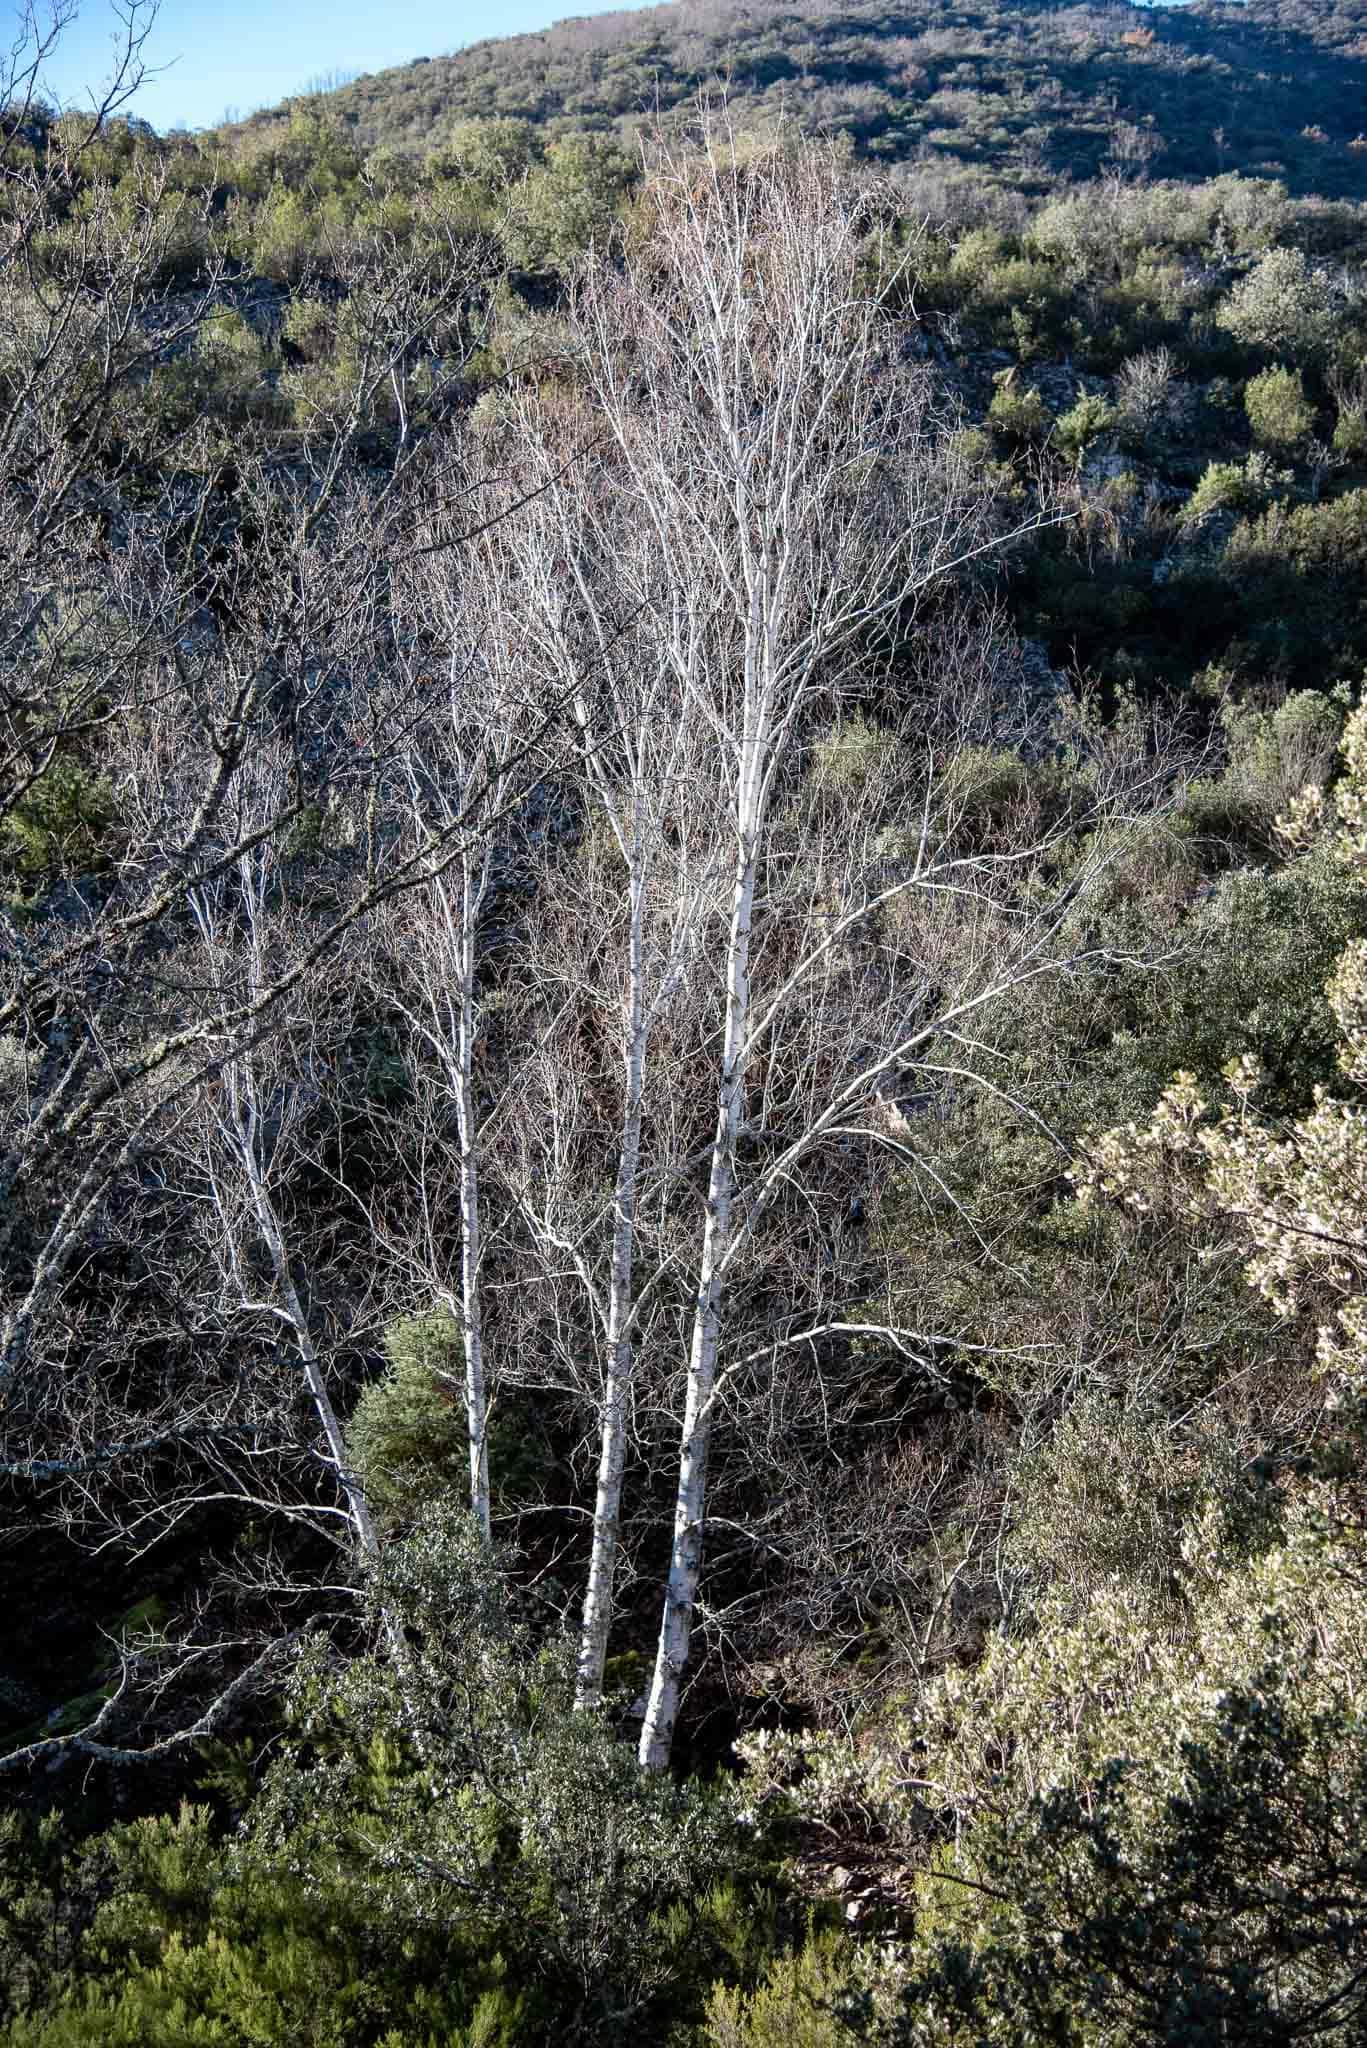 Abedul (Betula pendula subsp. fontqueri var. parvibracteata) en Navalucillos